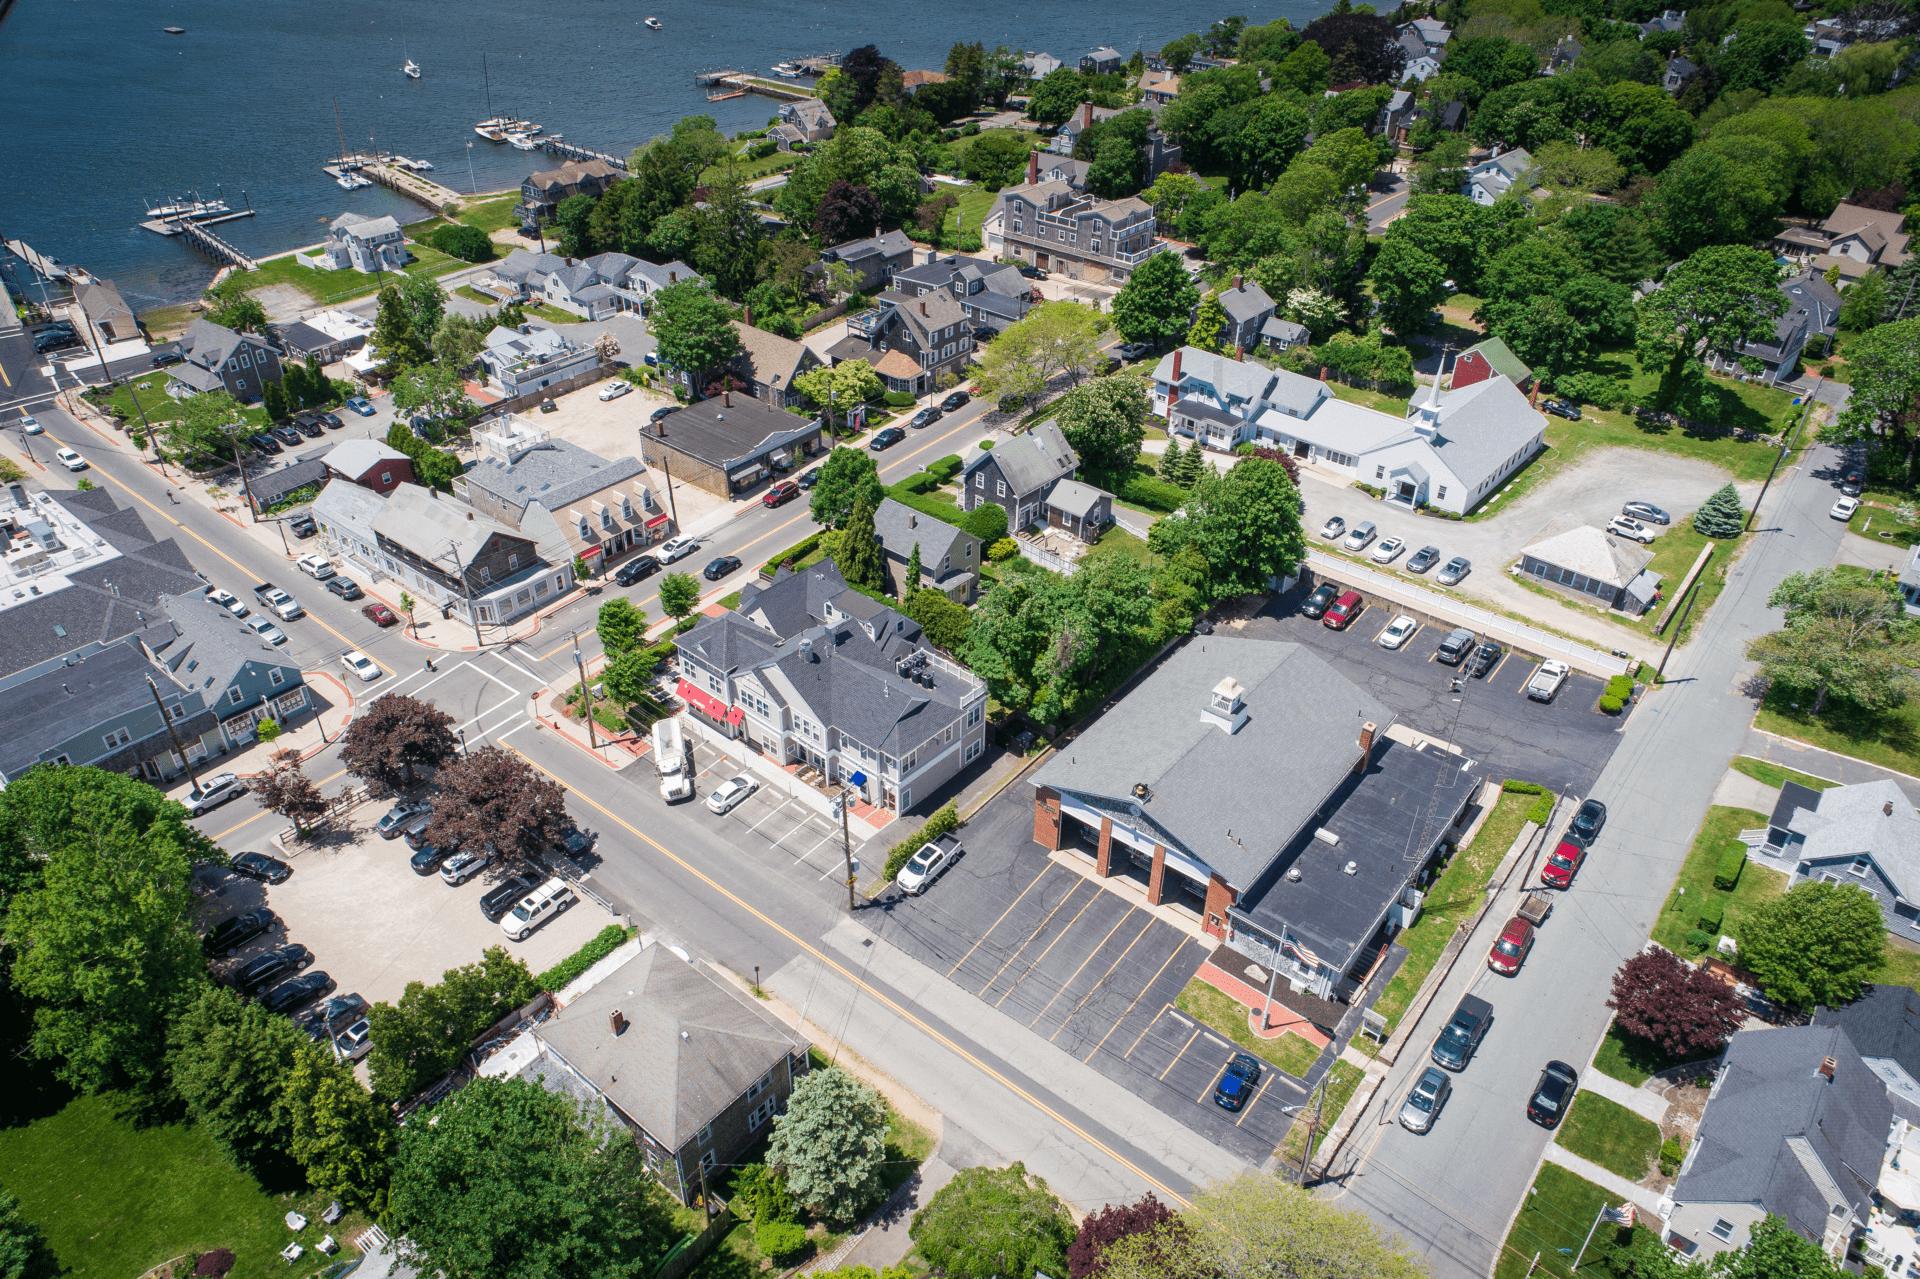 A drone photo of Padanaram Village in Dartmouth.